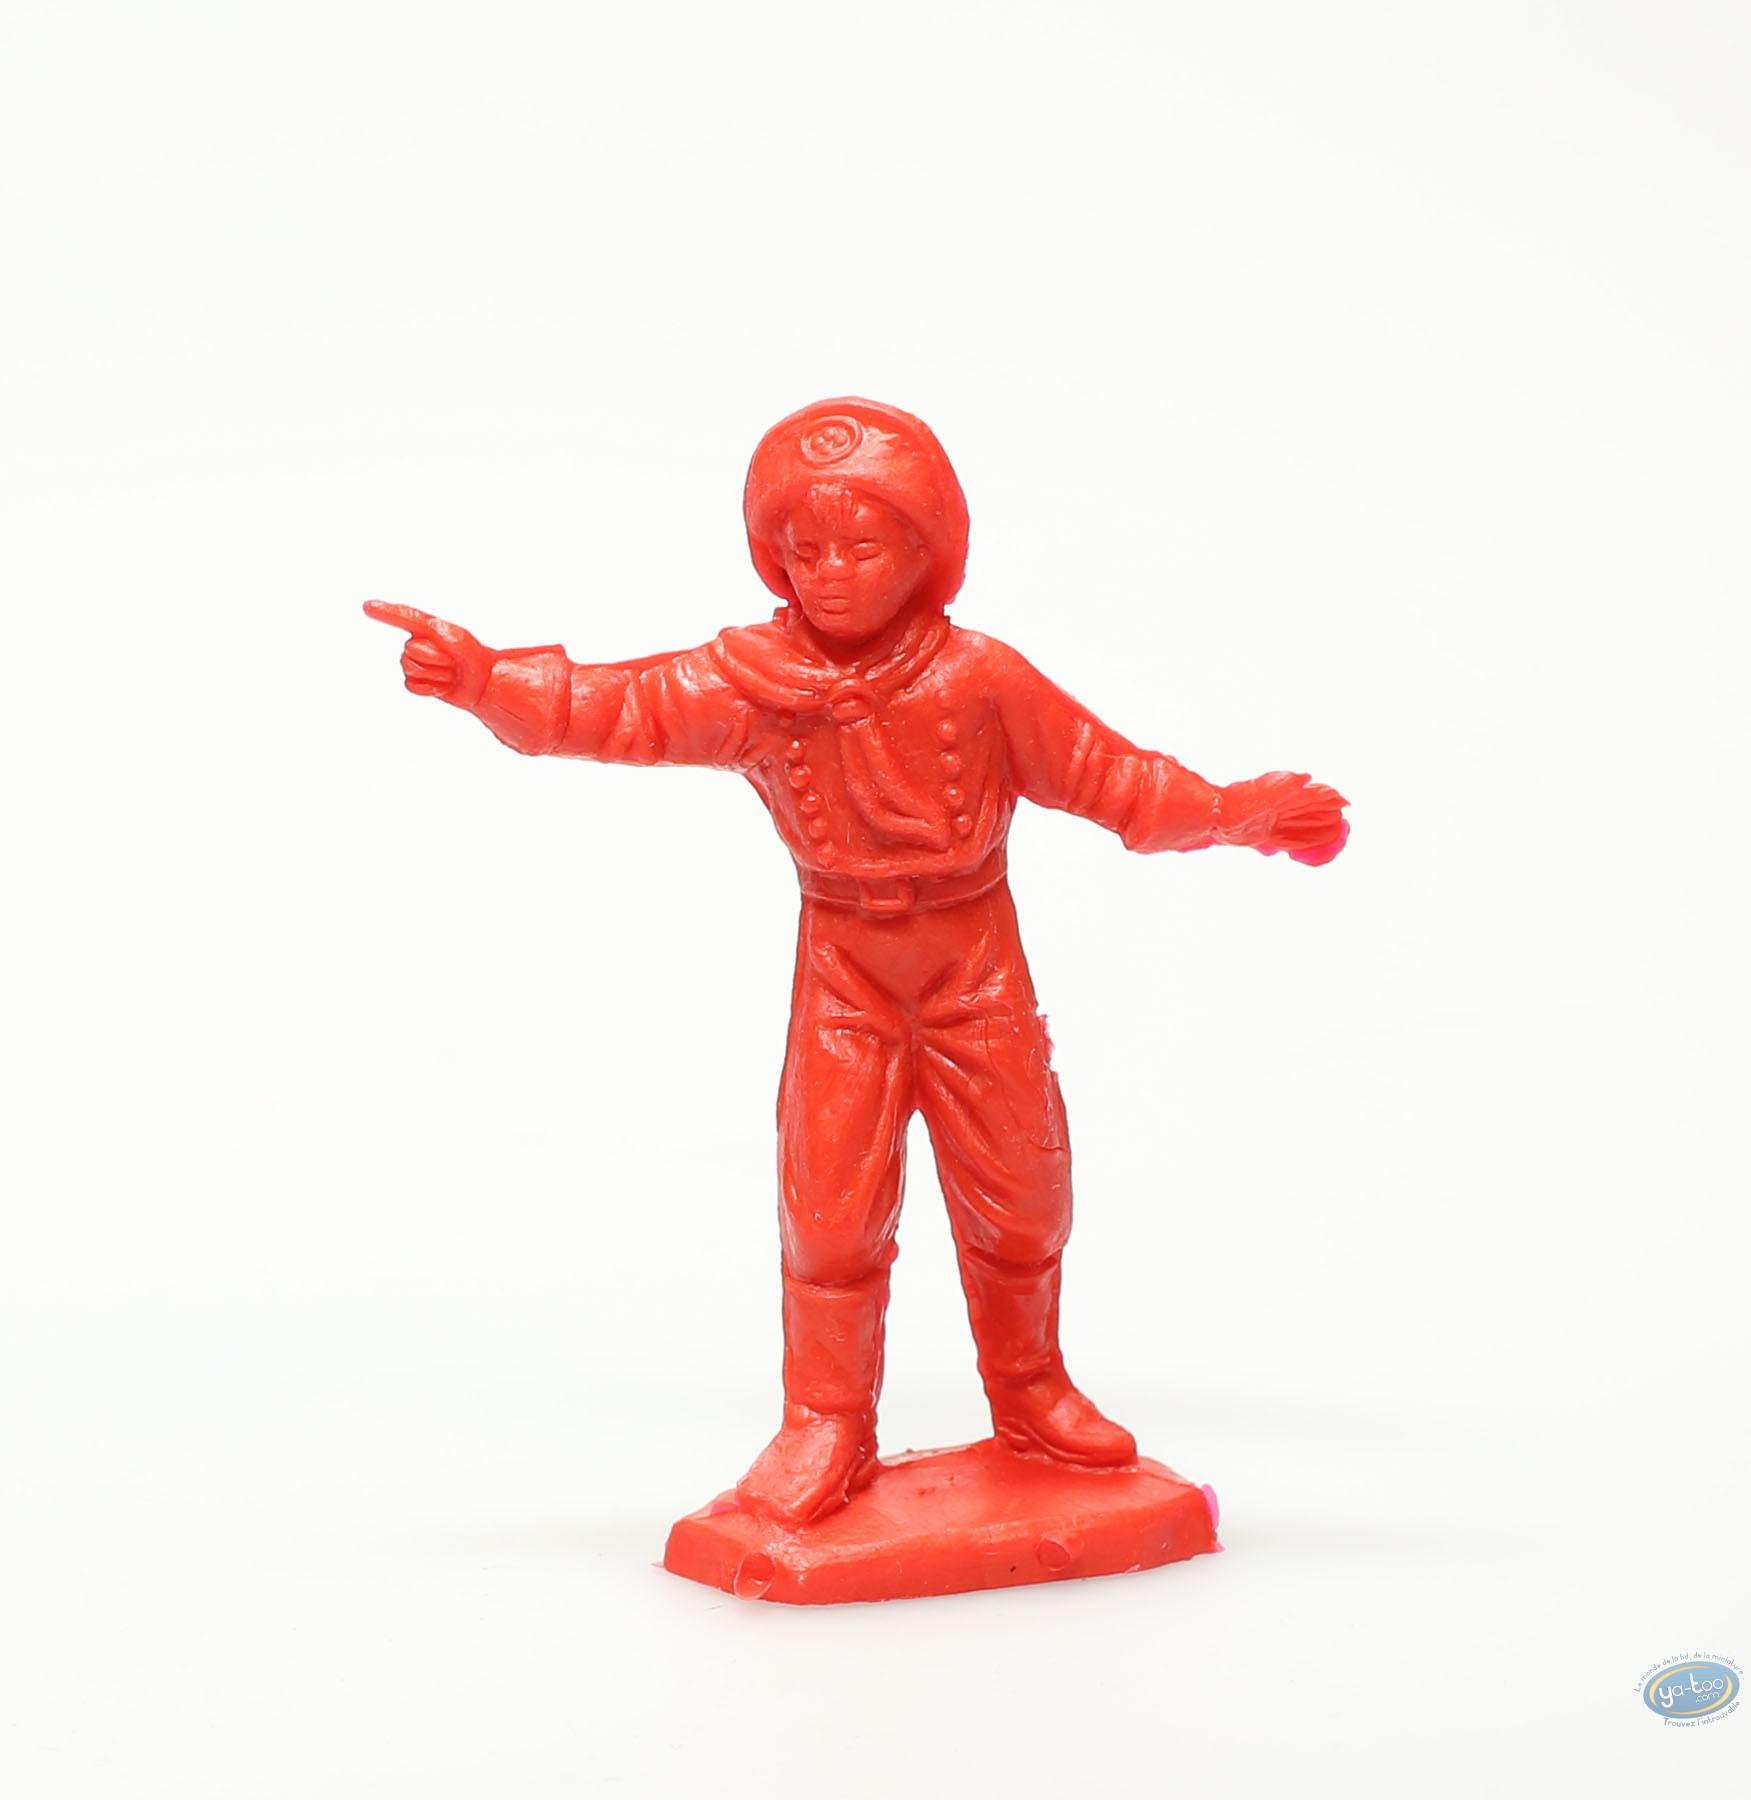 Figurine plastique, Rintintin : Rusty rouge montrant du doigt